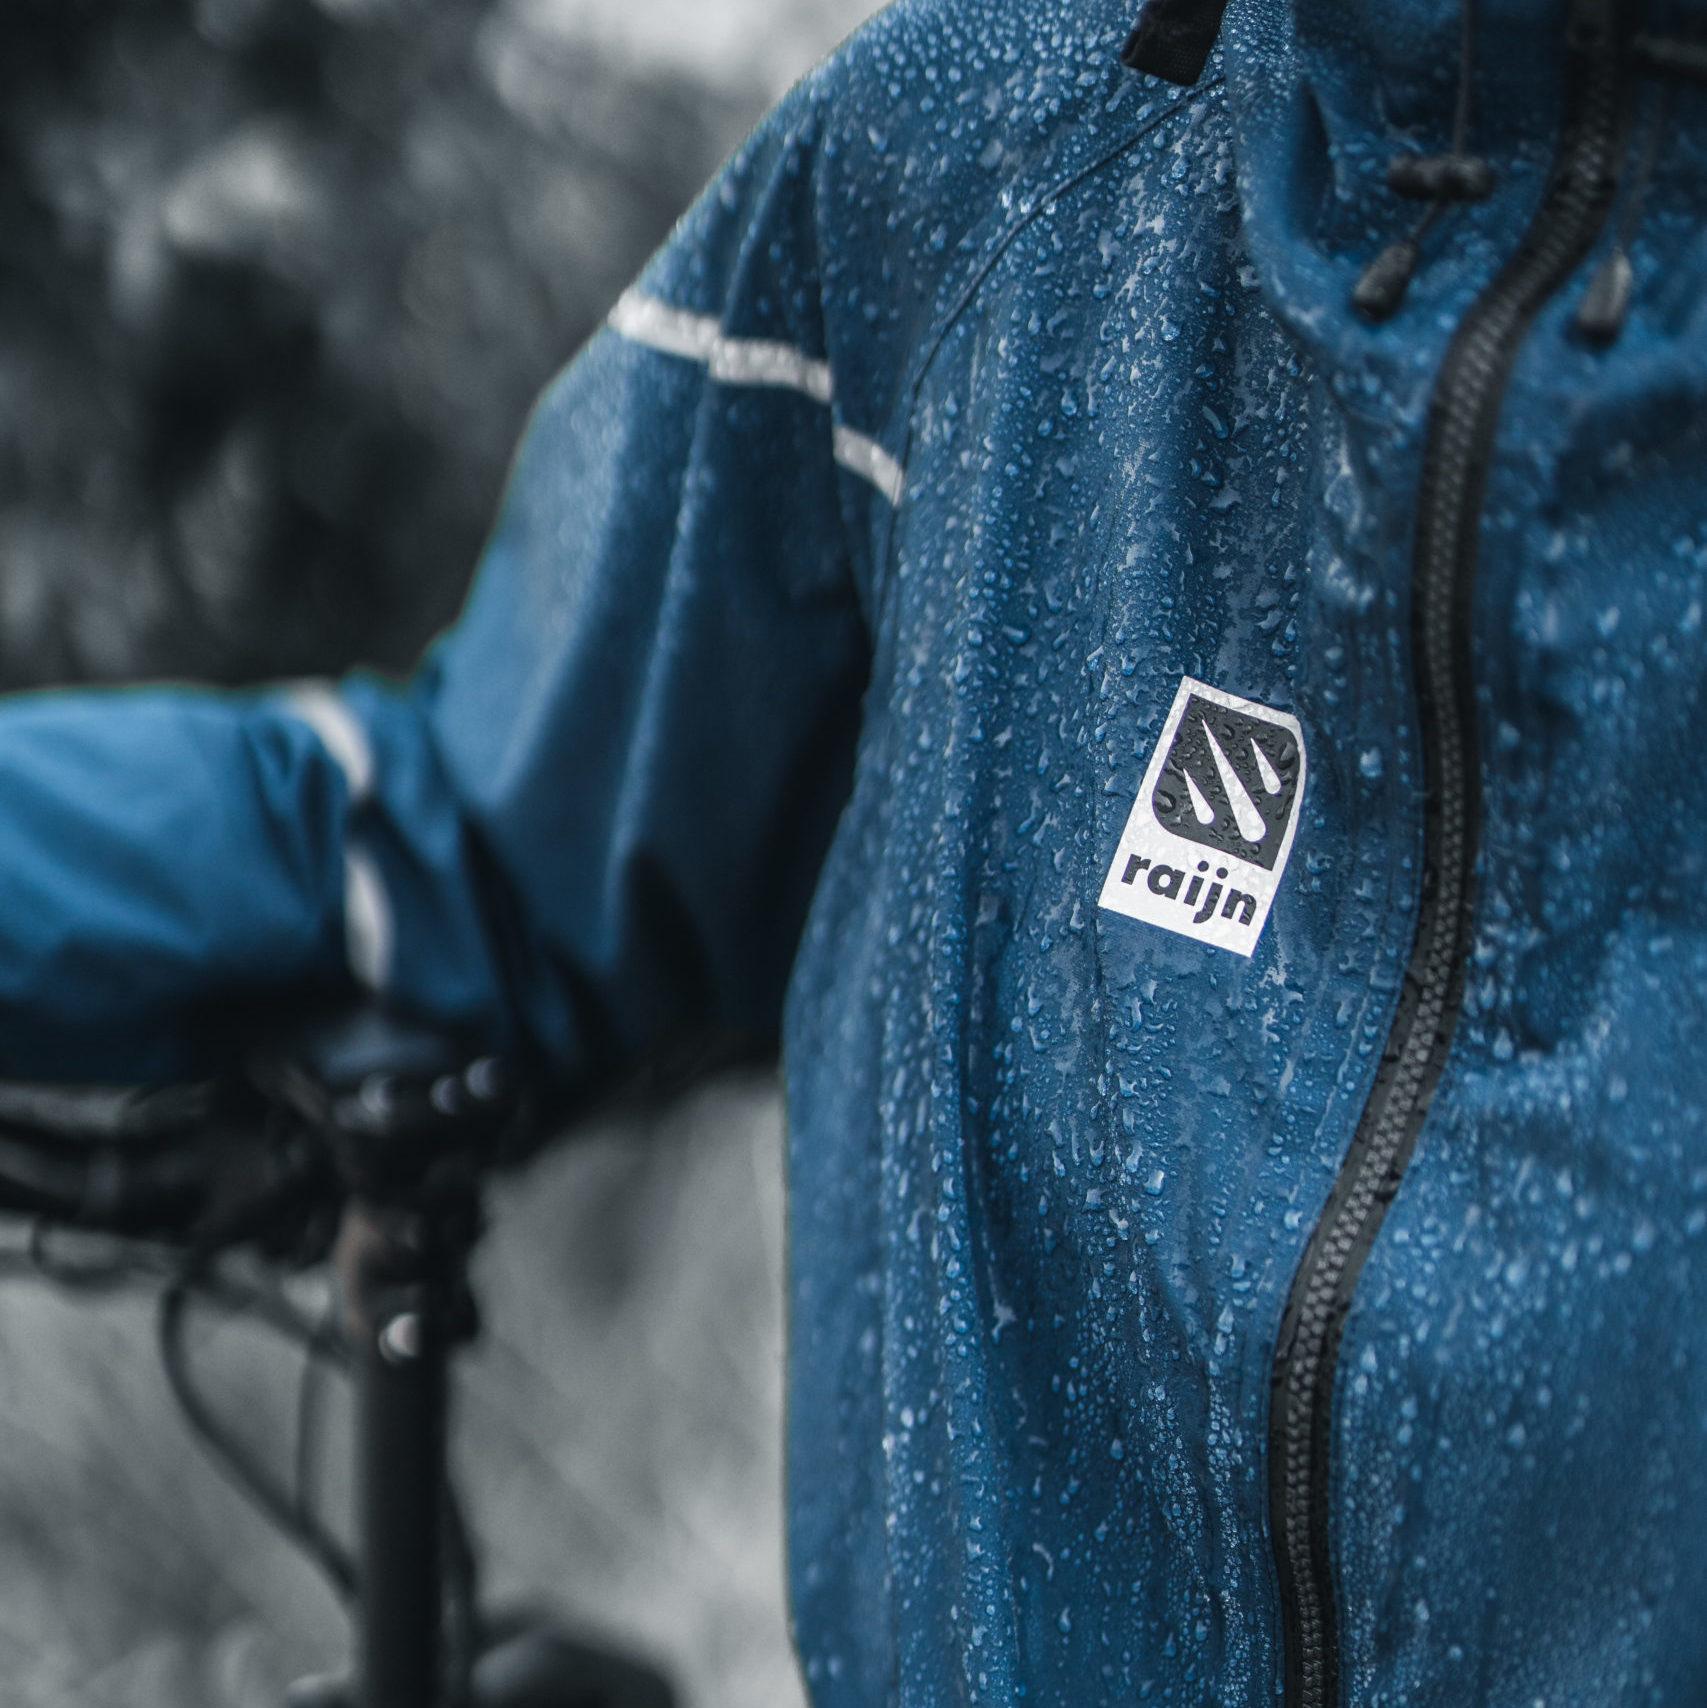 raijn regenbekleidung close up